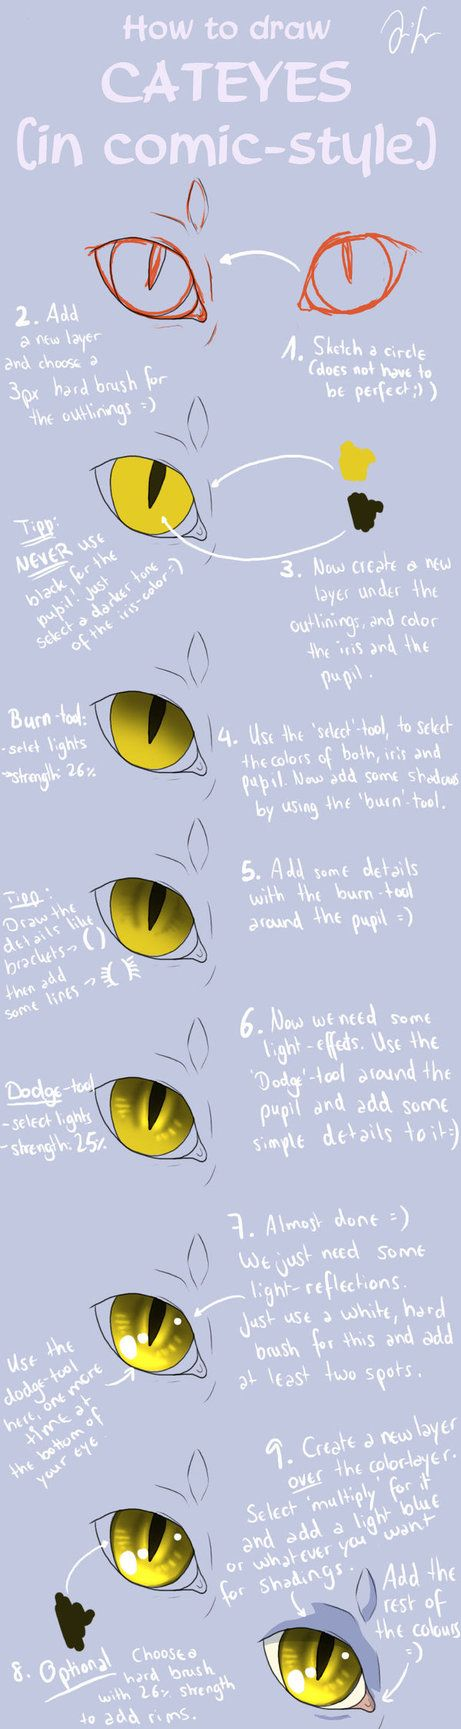 Cat Eye Tutorial (comic-style) by *Mizu-no-Akira on deviantART